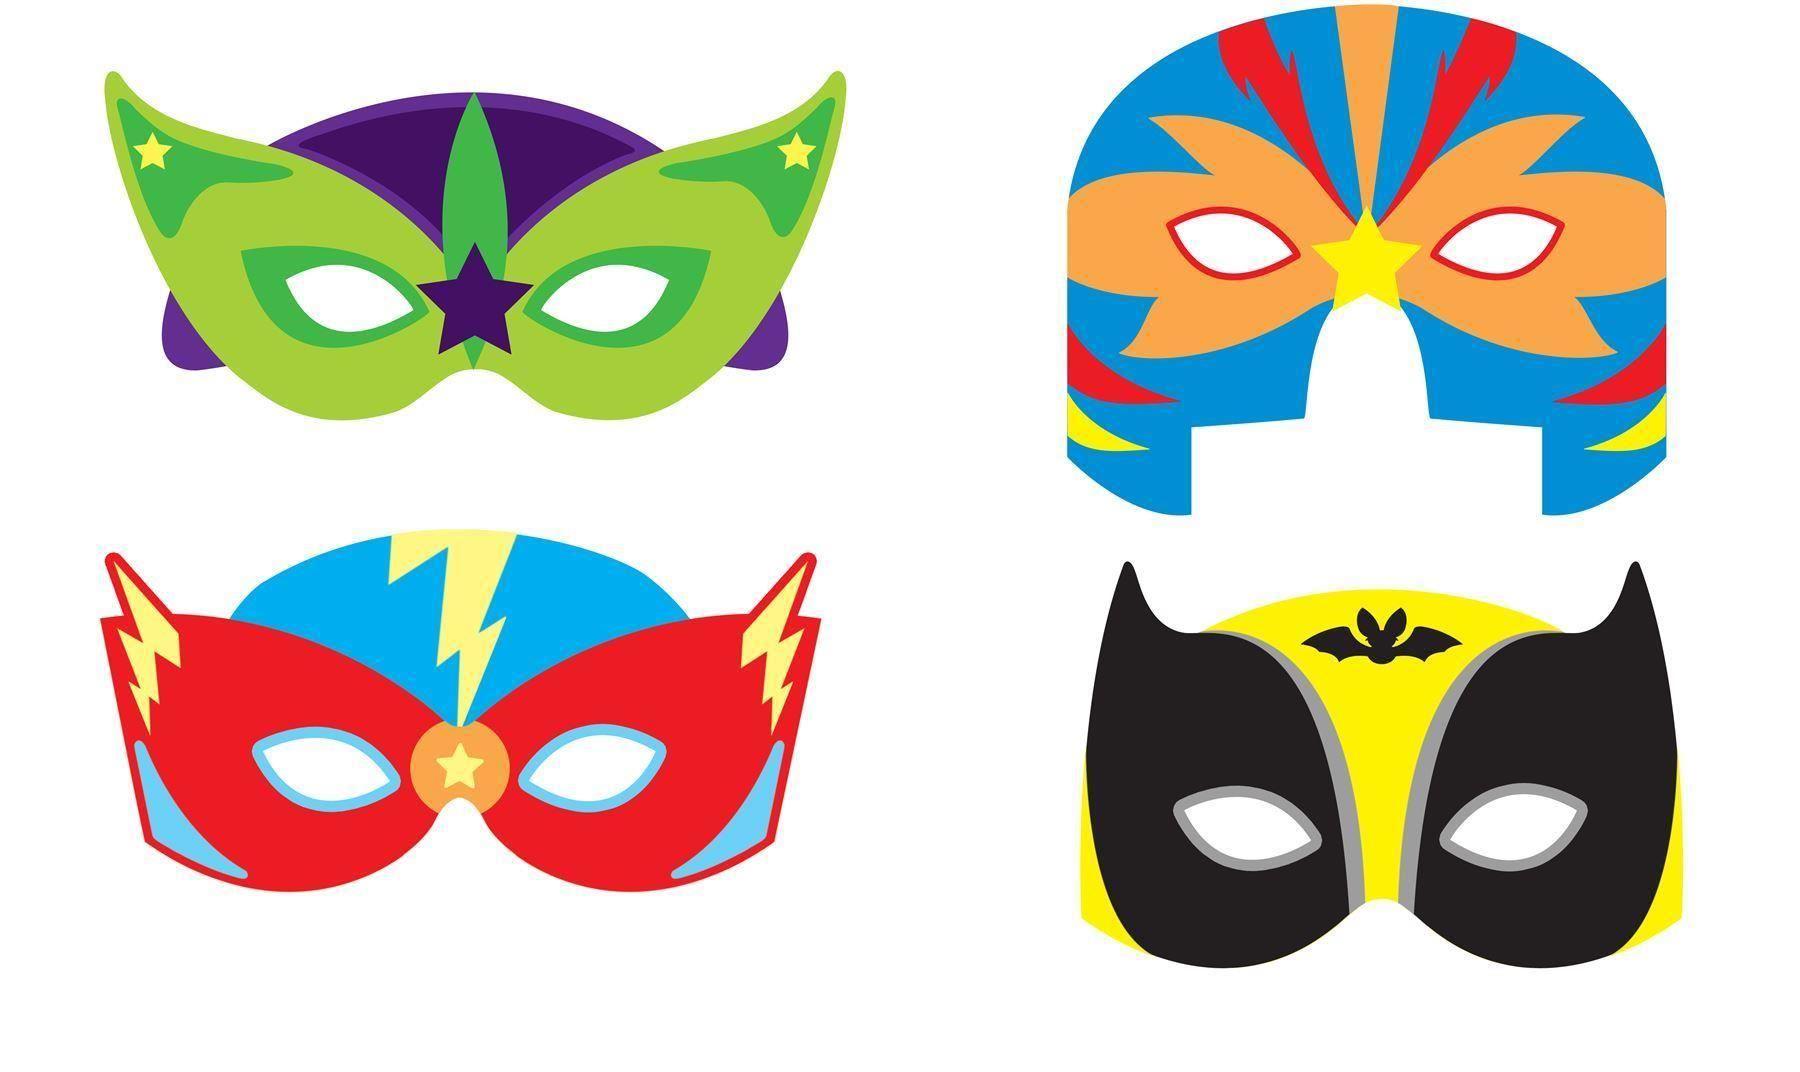 Super hero superhero eva foam eye mask fancy dress party - Masque super heros imprimer ...